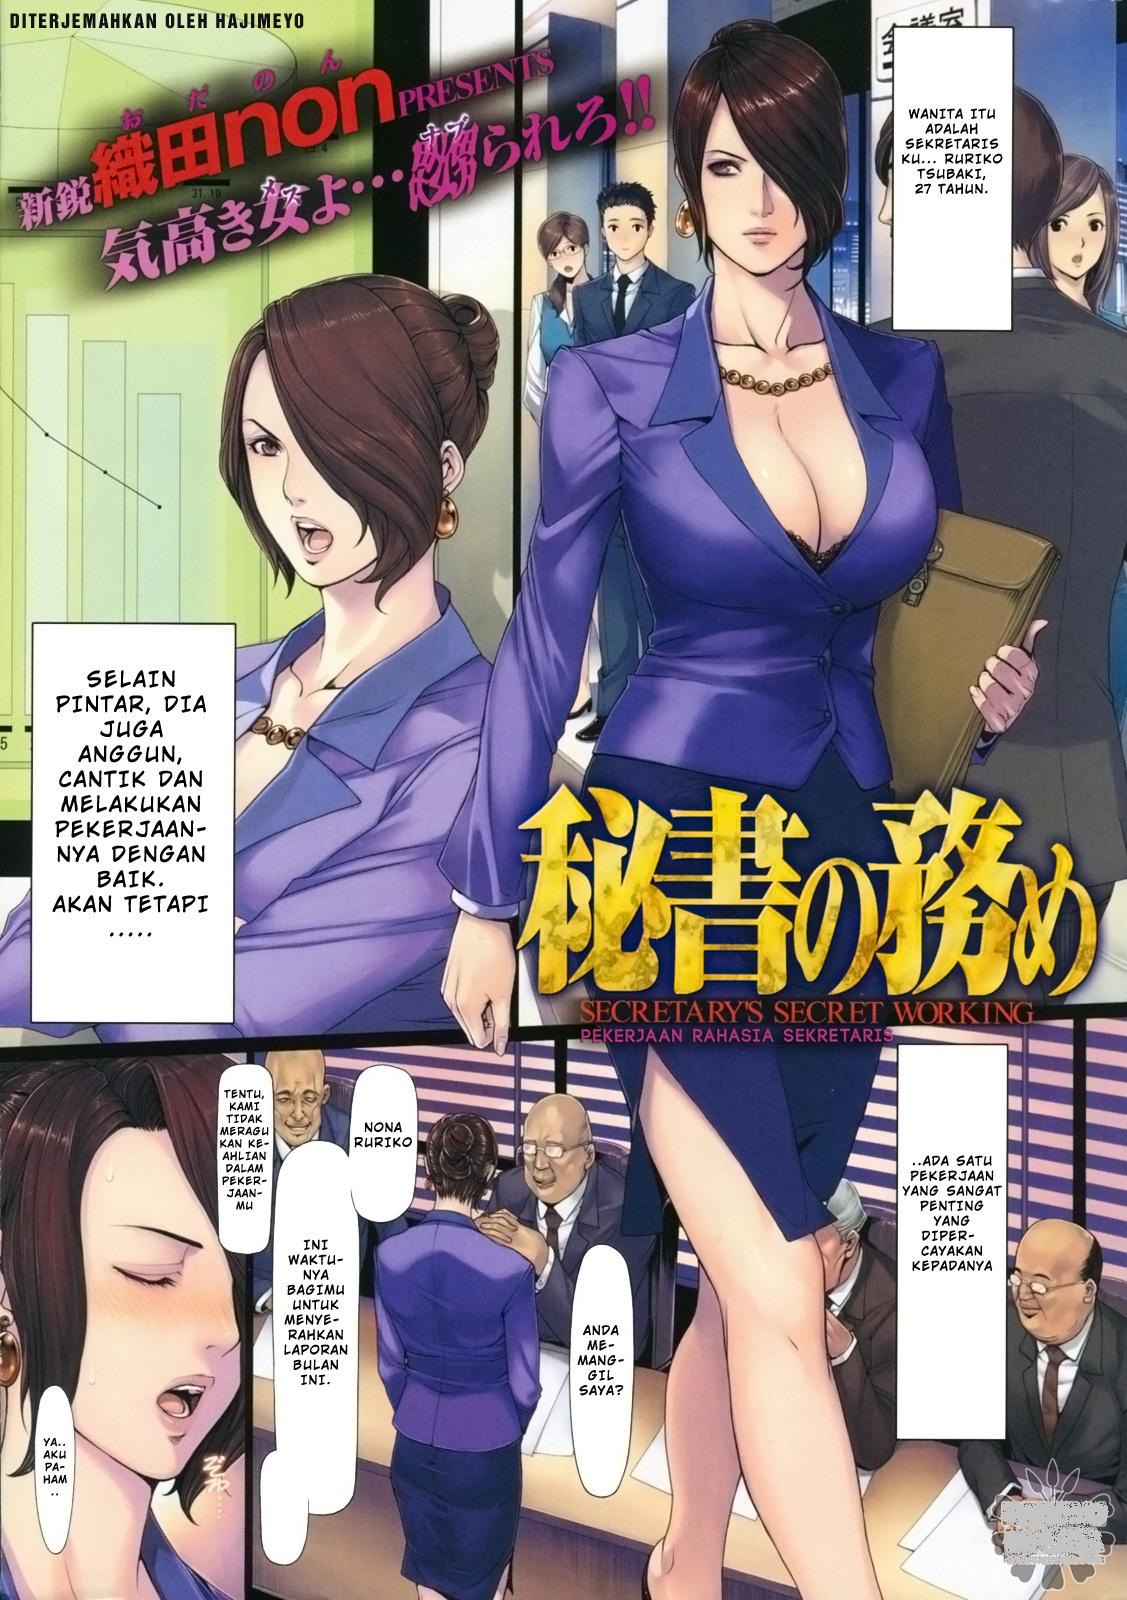 Komik Hentai | Manga Hentai | Komik XXX | Komik Porno | Komik SEX | komik dewasa | komik ngentot | komik hentai sex | komik sex naruto | komik sex one piece | komik hentai manga | komik sex hot komik hentai berwarna ngentot sekretaris di kantor